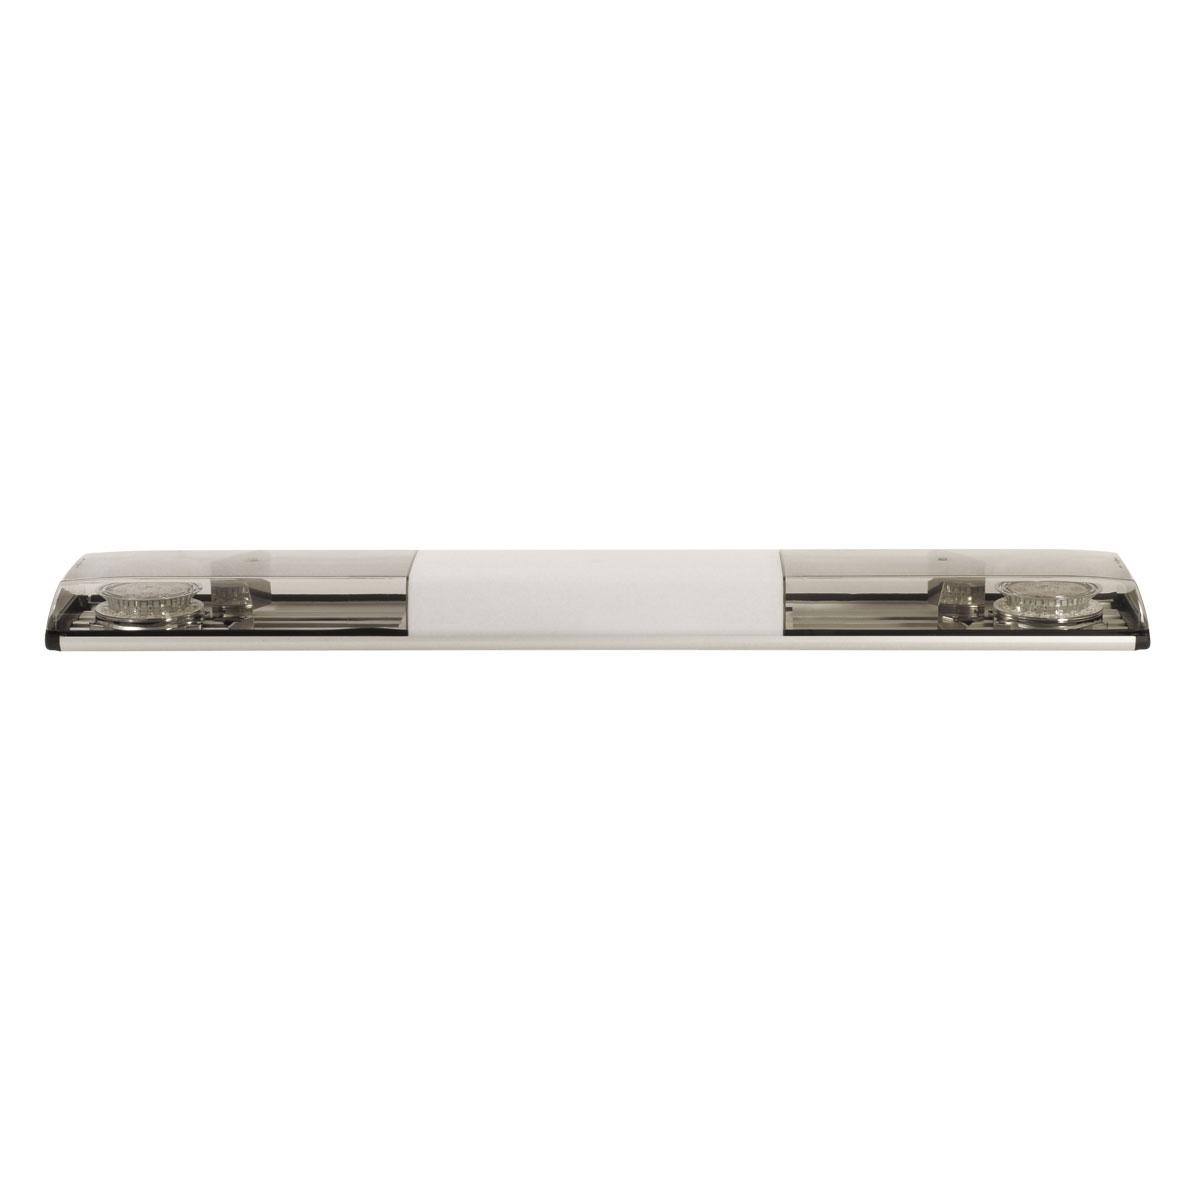 LED Lichtbalken Modell K9L15R2S2ATW/4 topasgrau